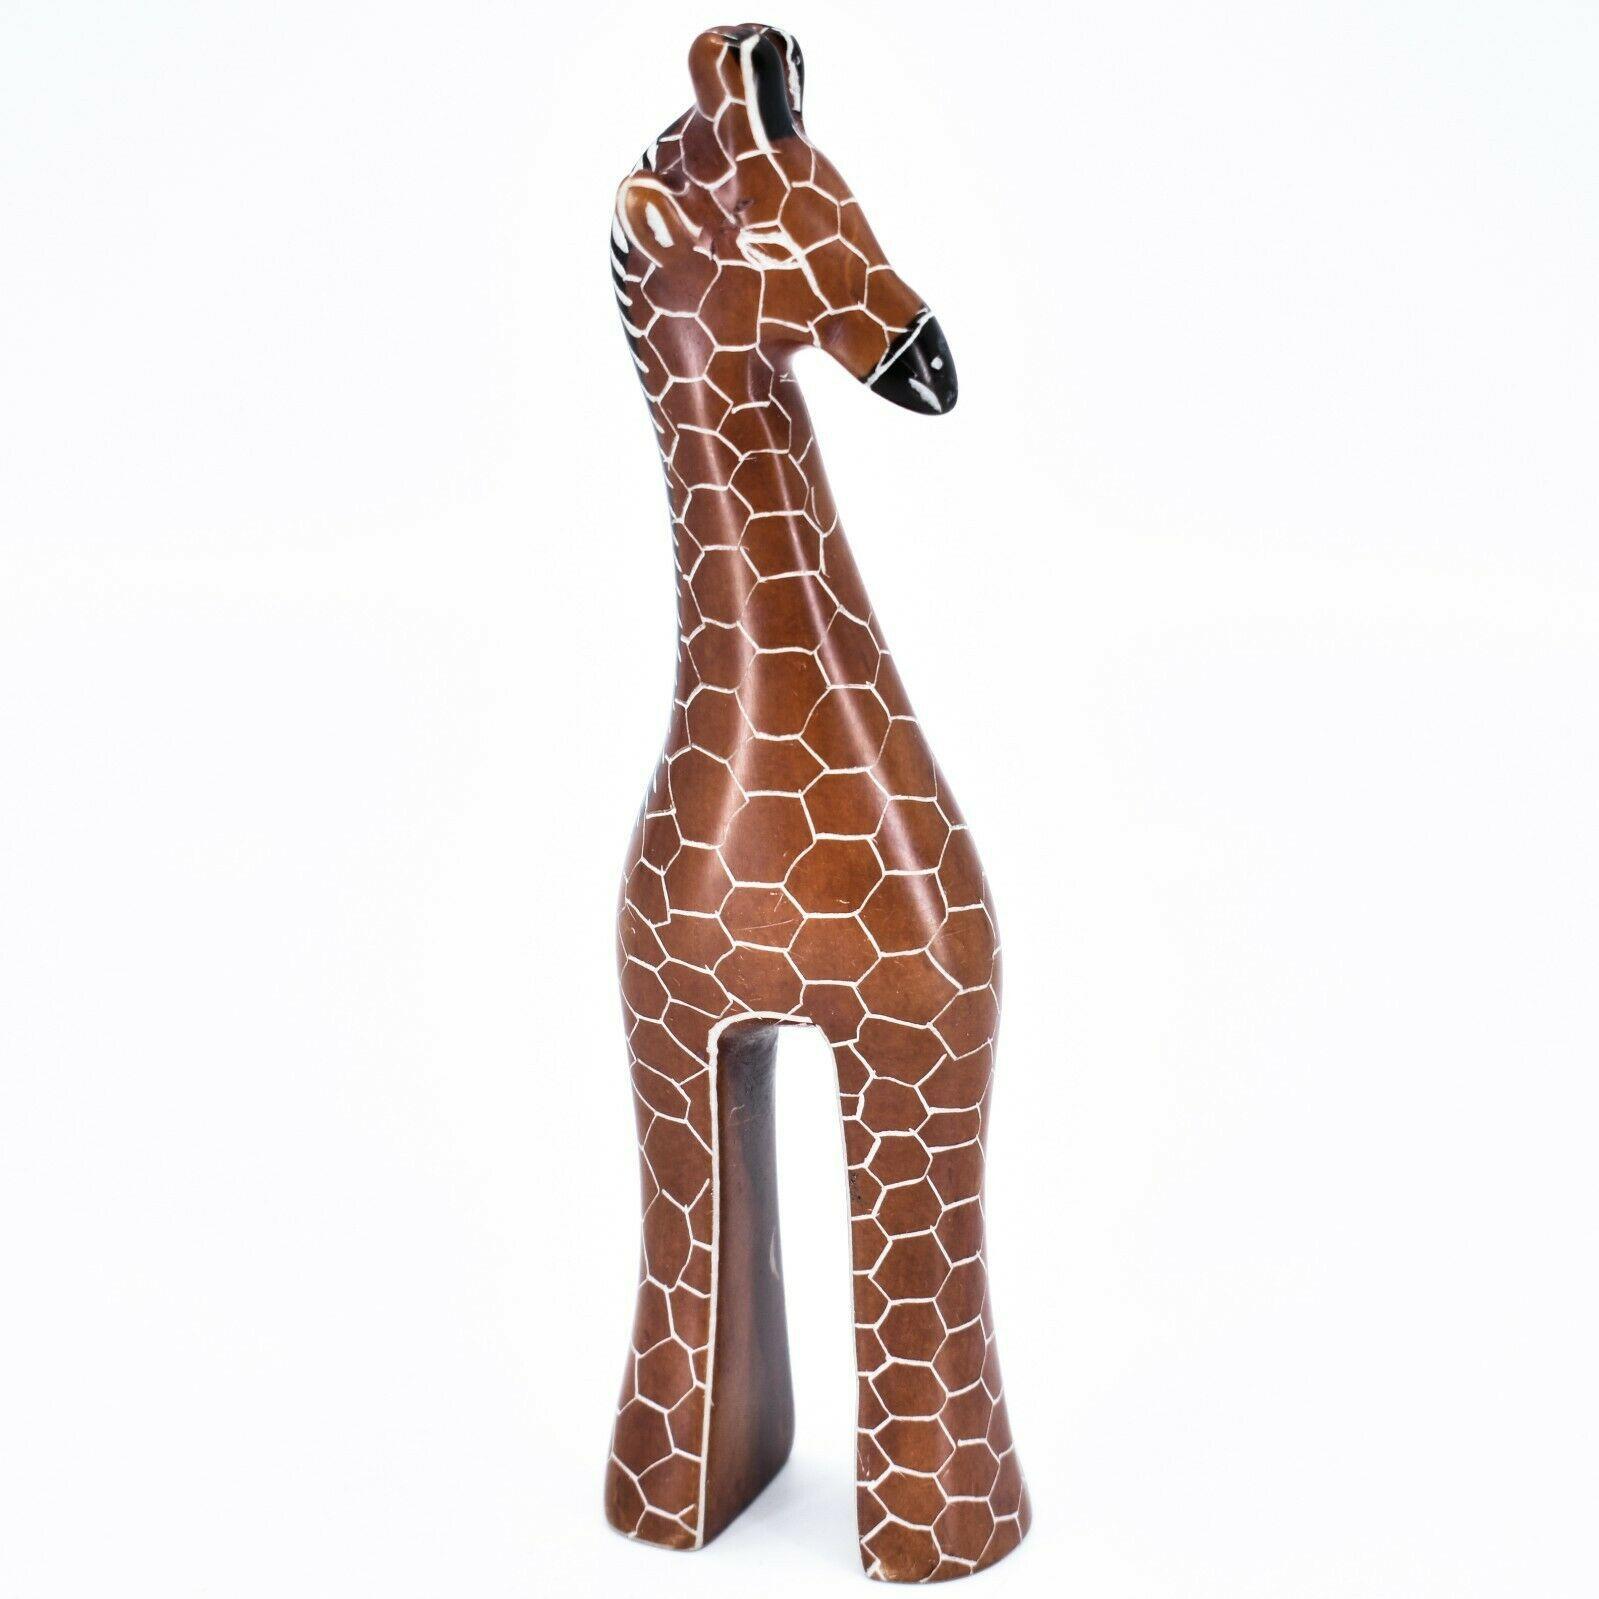 "Crafts Caravan Hand Carved Soapstone Stately Giraffe 6.5"" Figurine Sculpture"